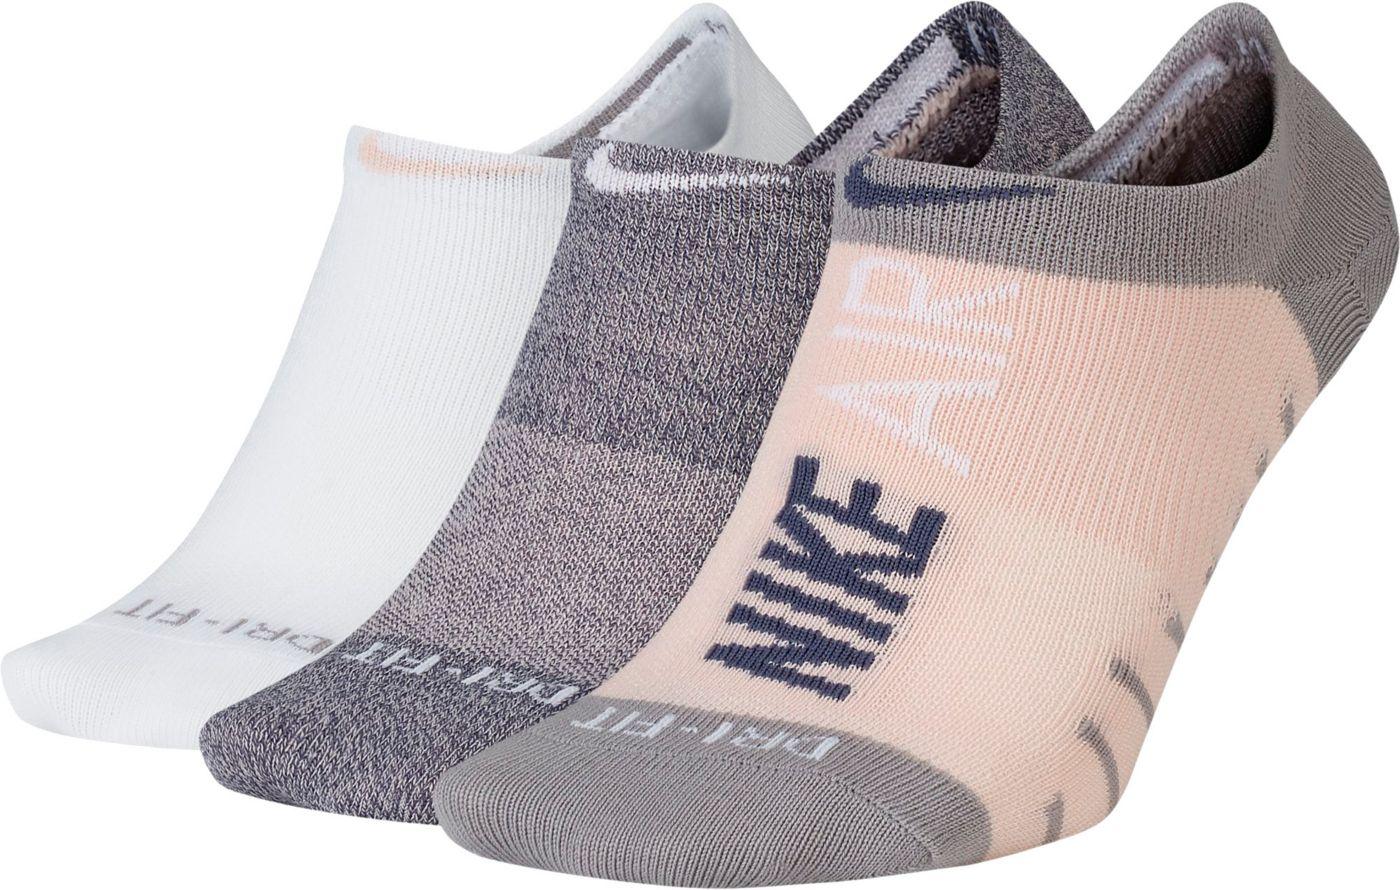 Nike Women's Everyday Max Lightweight No-Show Training Socks 3-Pack